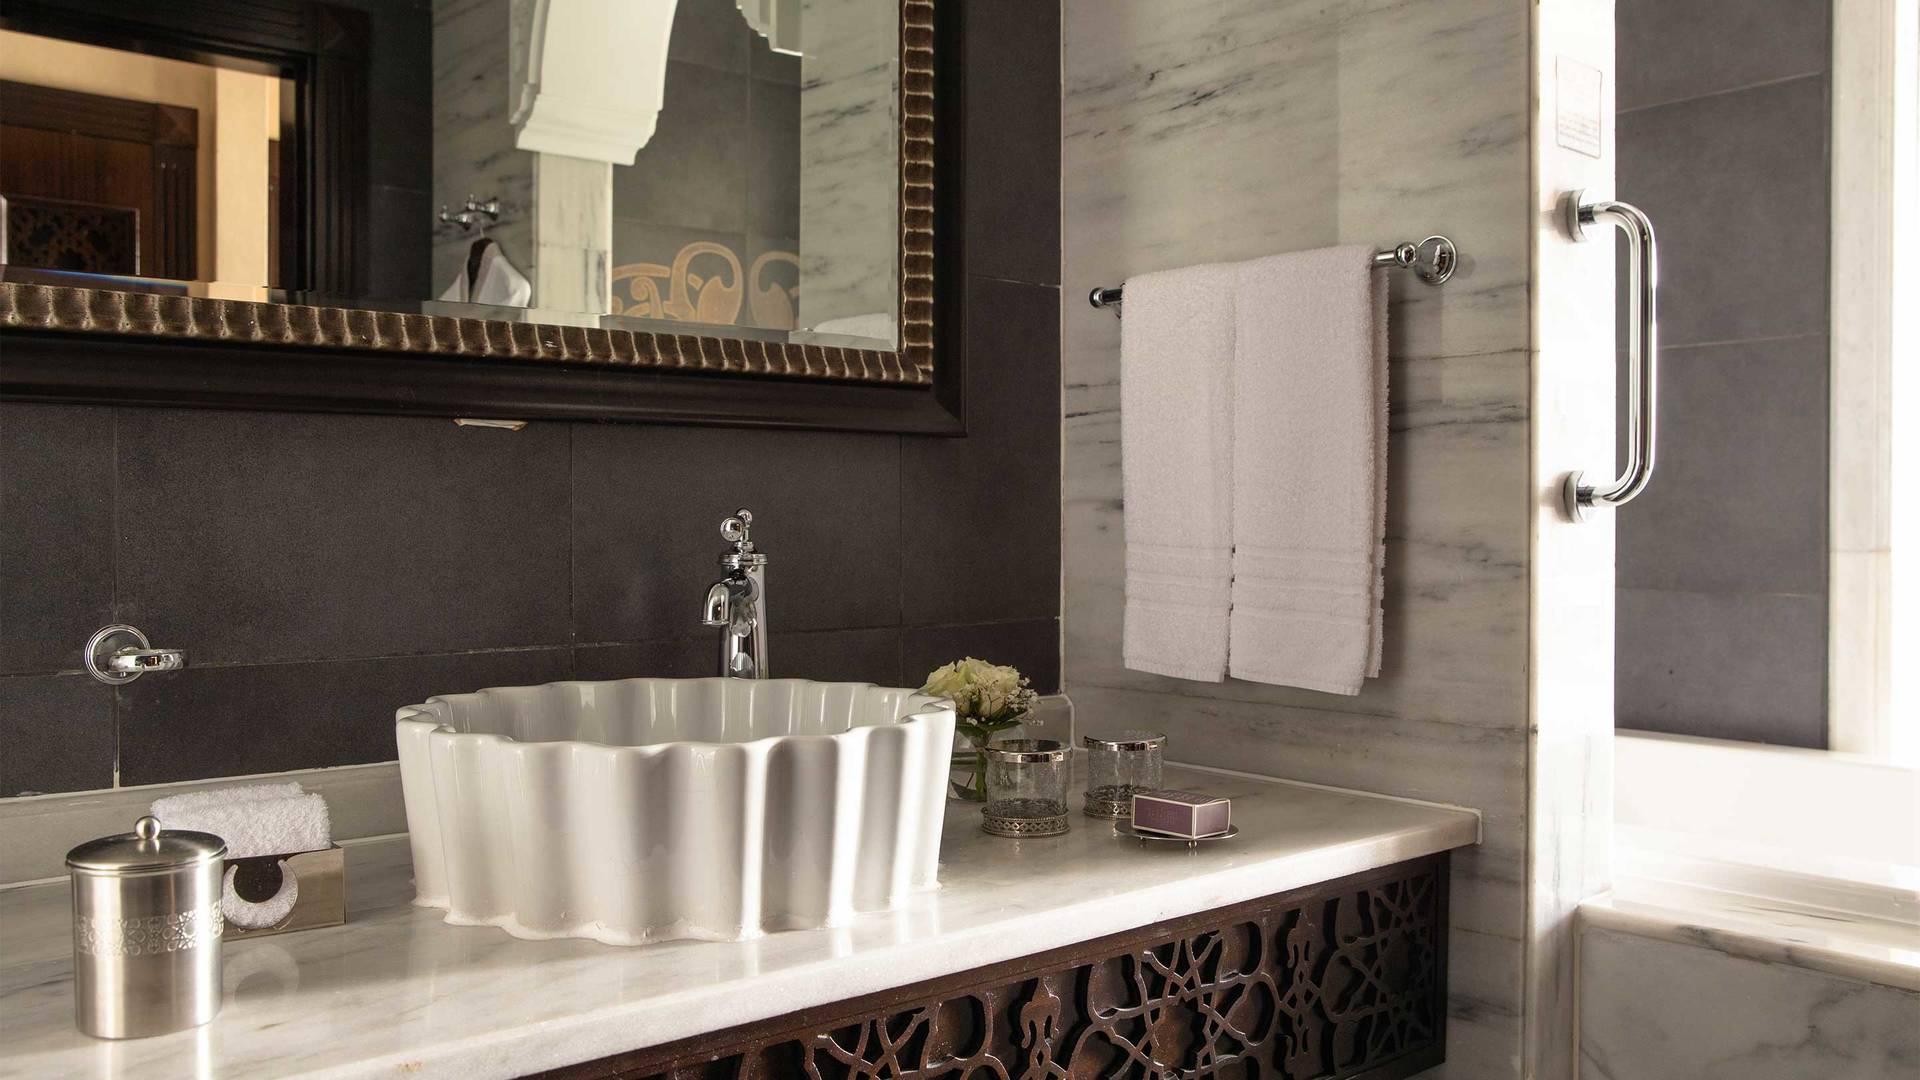 16-9 Room Jumeirah Zabeel Saray Suite Bathroom Sink